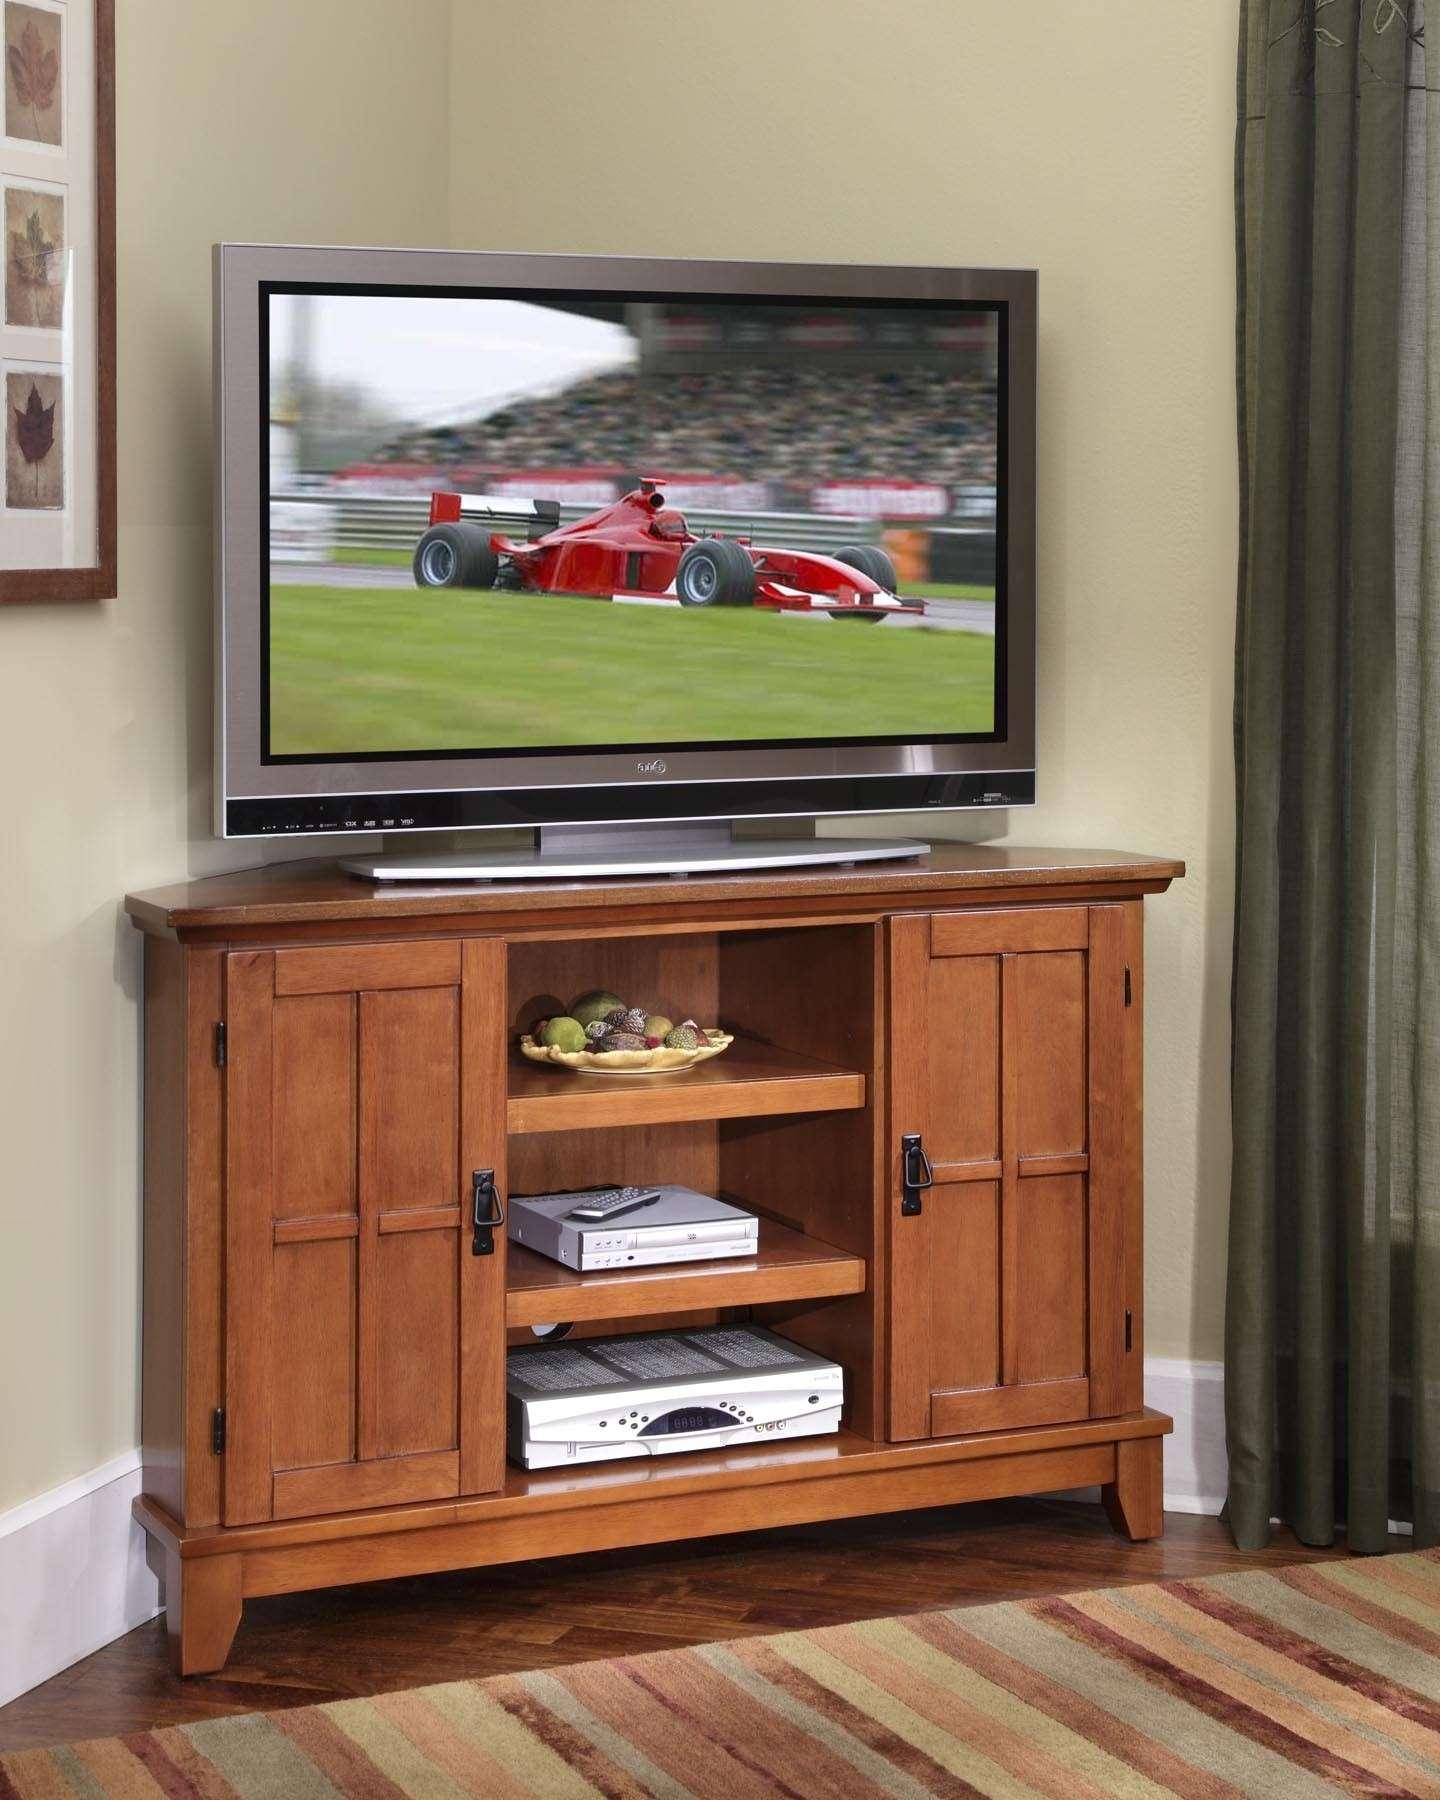 Home Styles 5180 07 Arts Crafts Cottage Oak Corner Tv Stand Inside Dark Brown Corner Tv Stands (View 11 of 15)